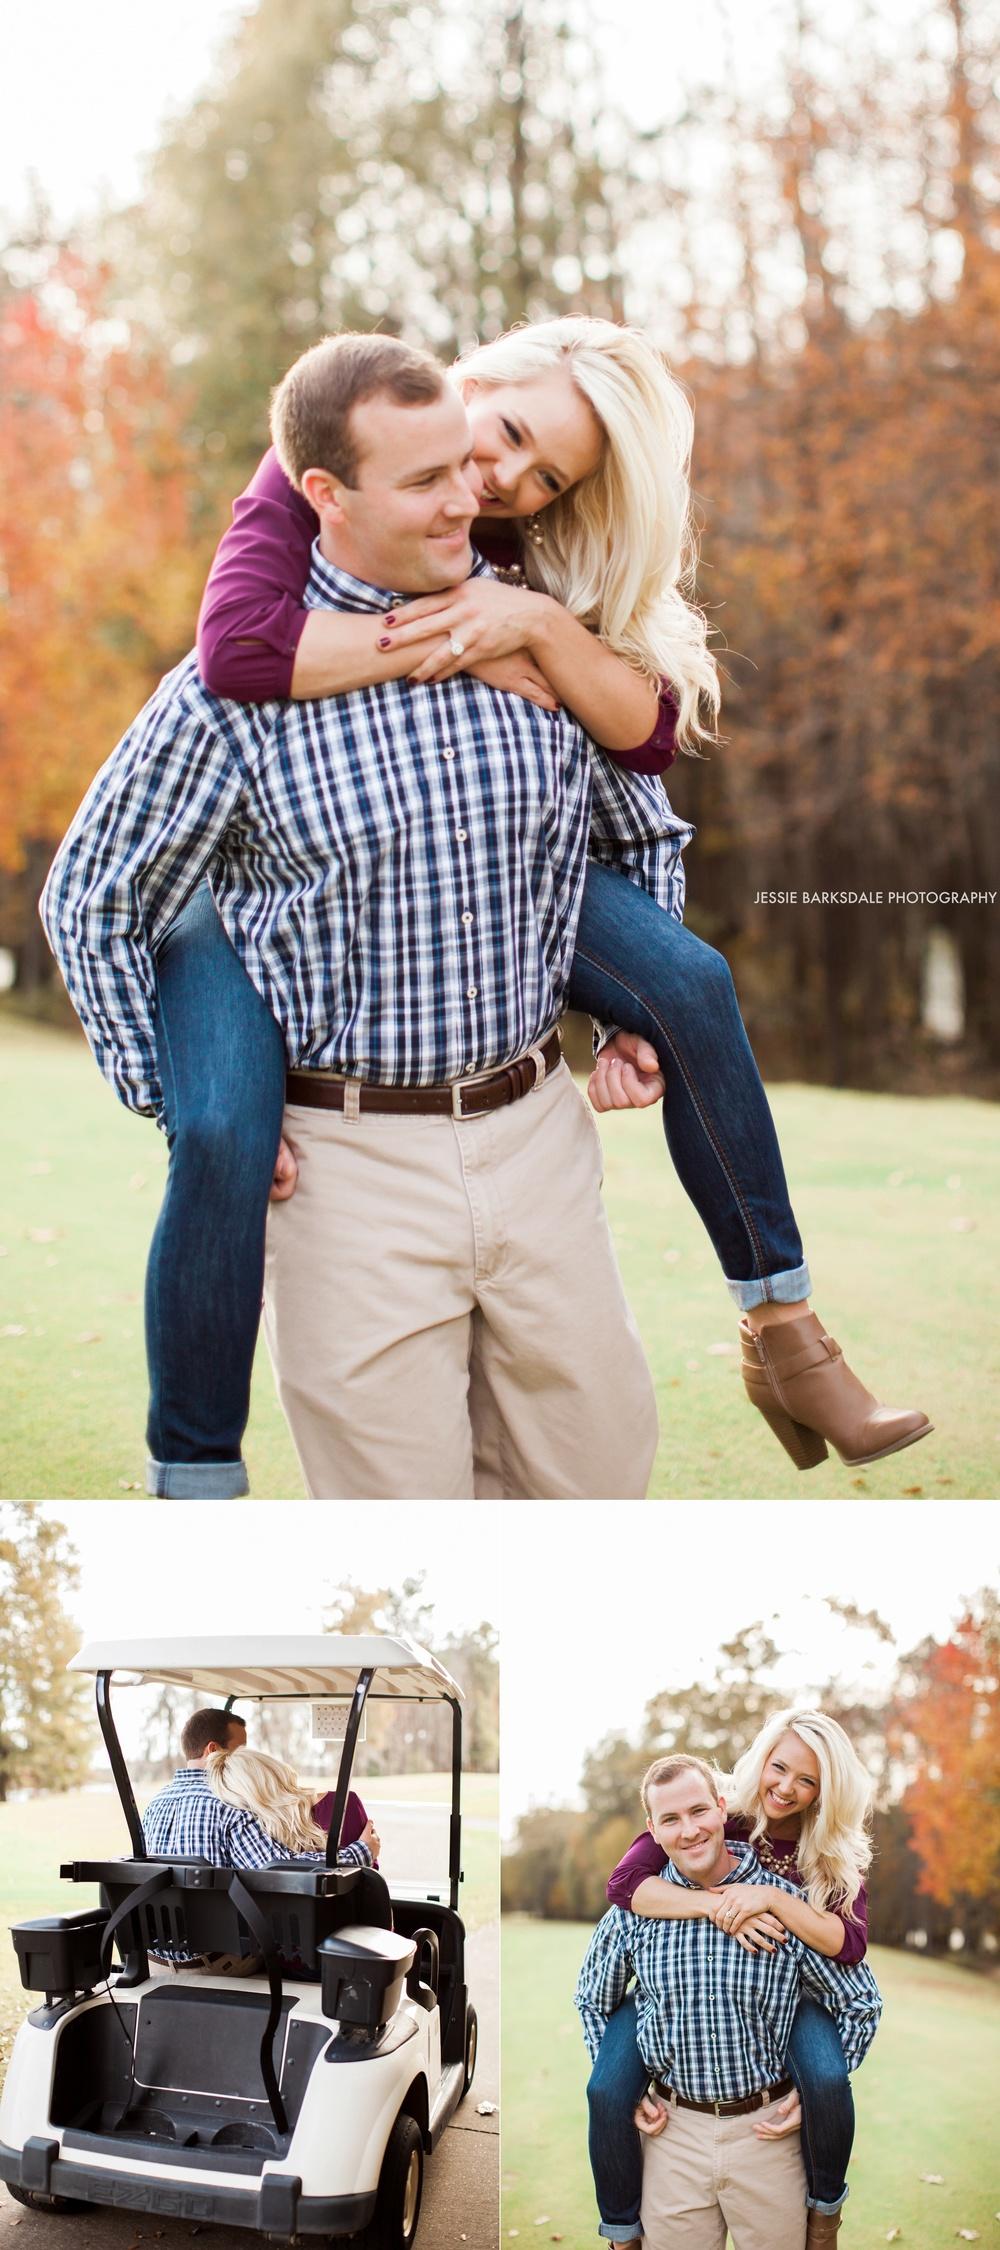 Jessie Barksdale Photography_Alabama Destination Wedding Photographer_Robert Trent Jones Capitol Hill_Engagement_0003